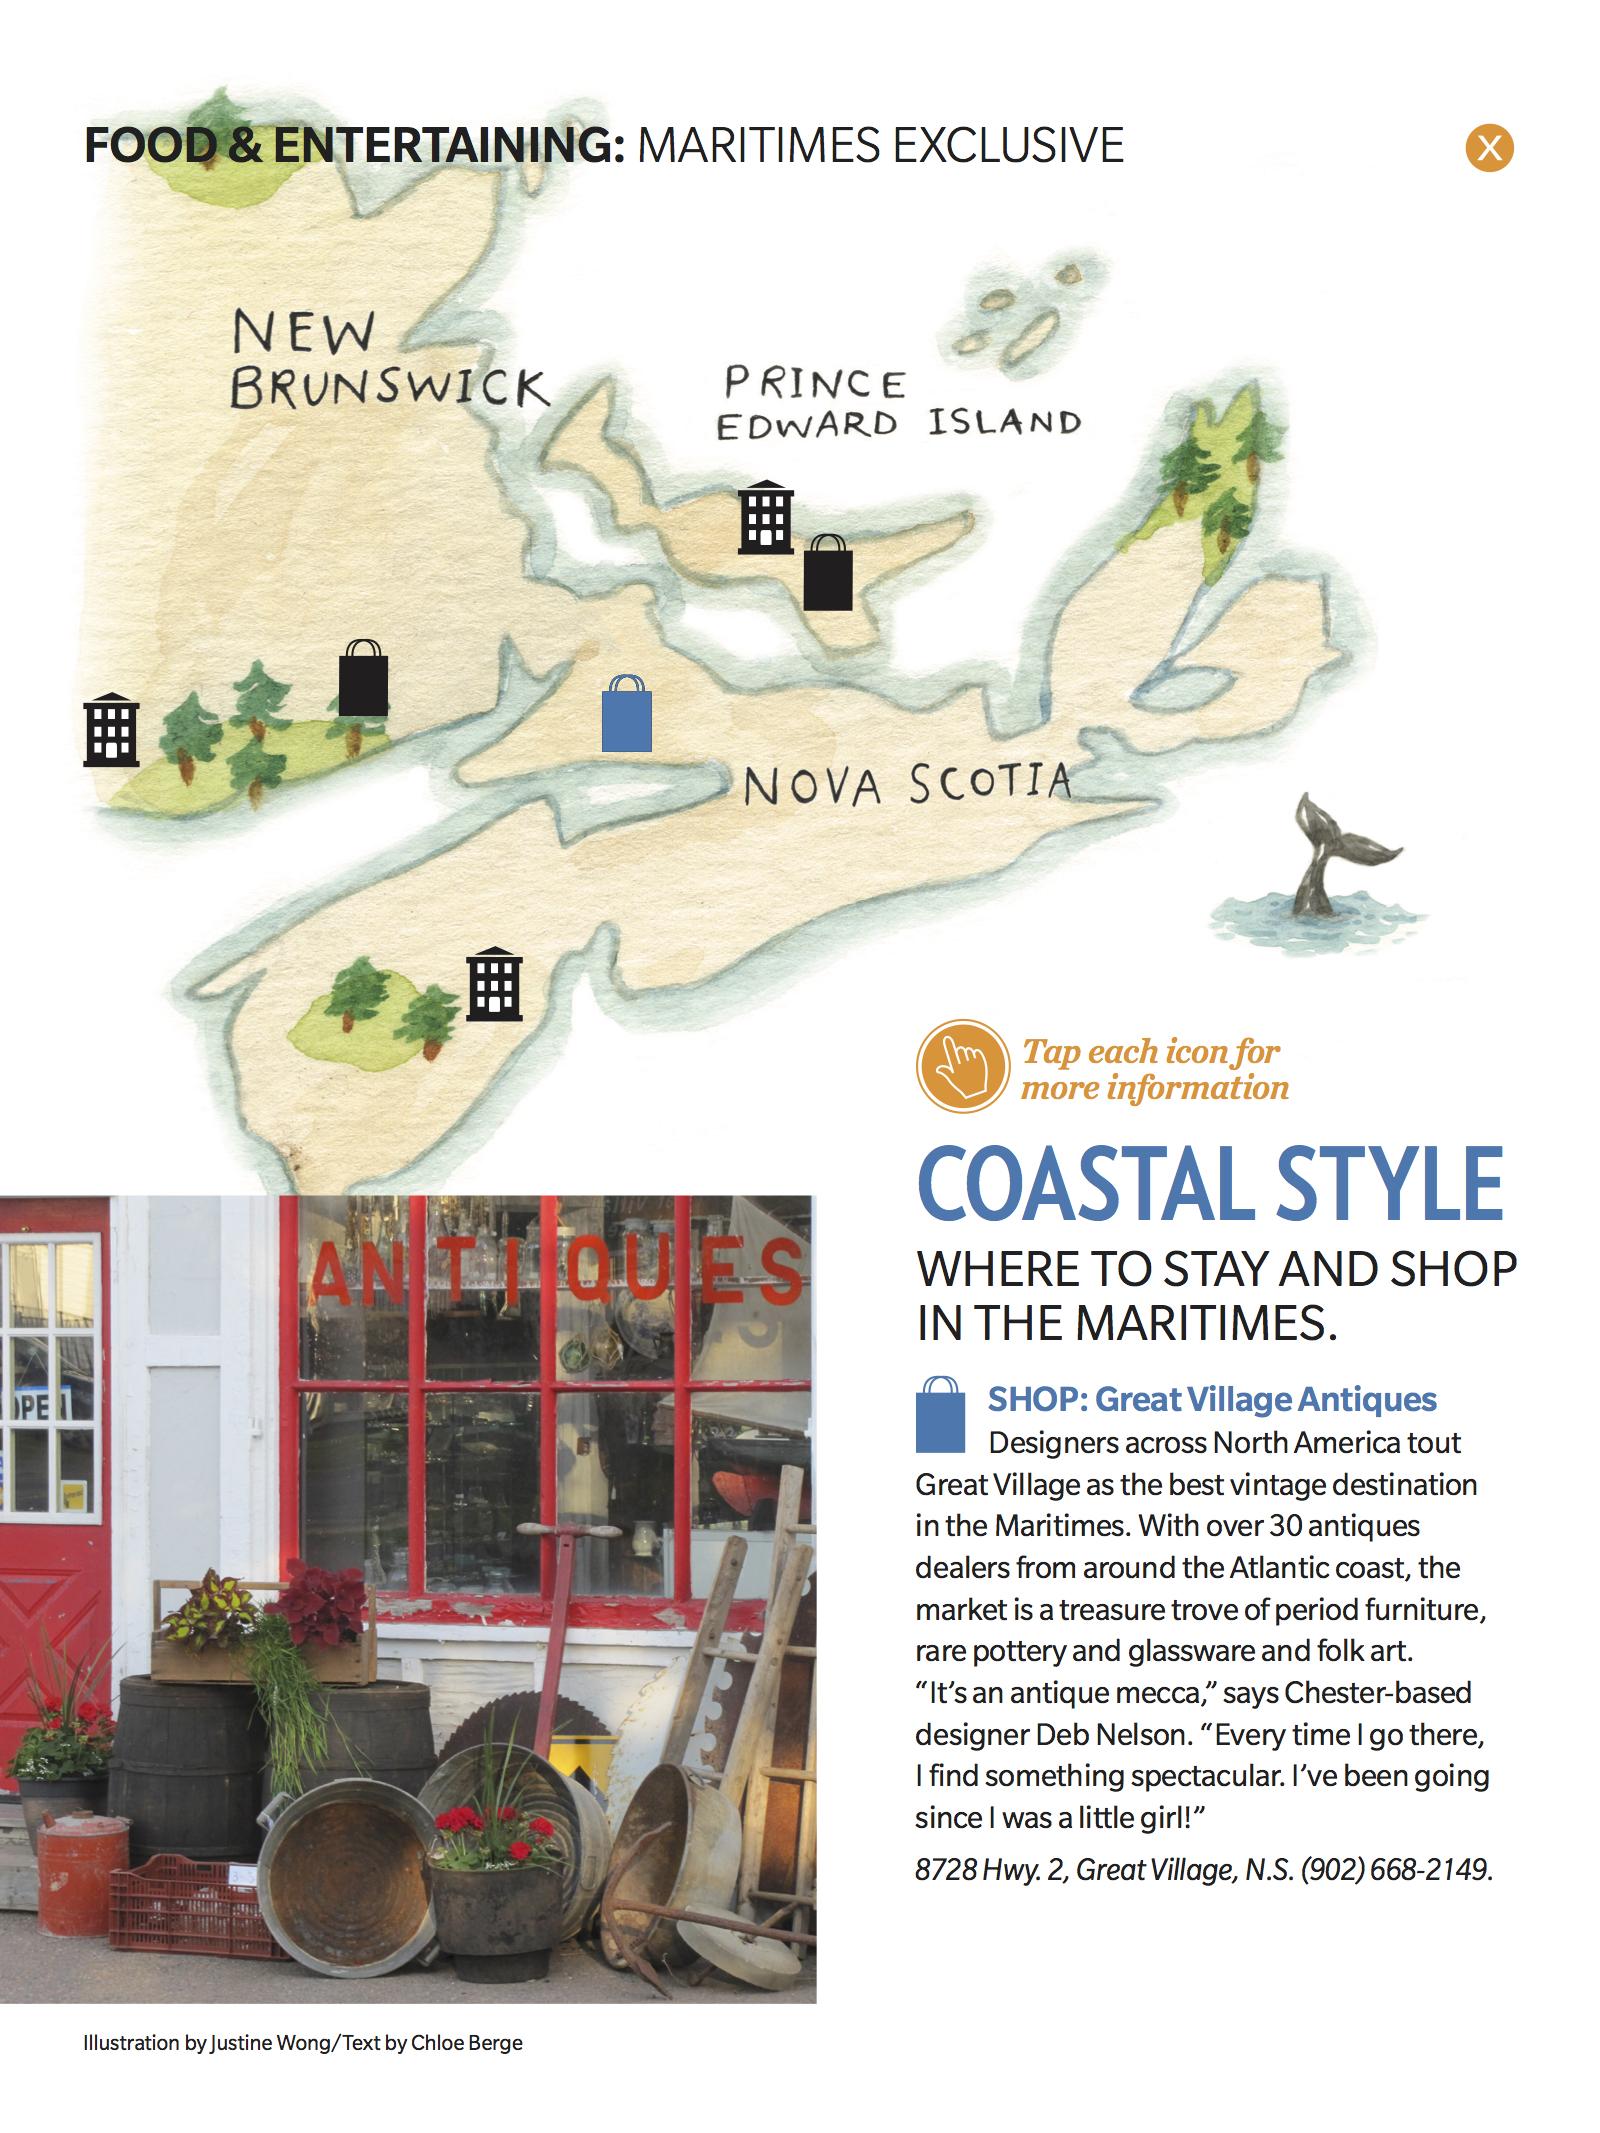 East Coast Travel Guide_House & Home Magazine iPad Edition_July 2014.jpg